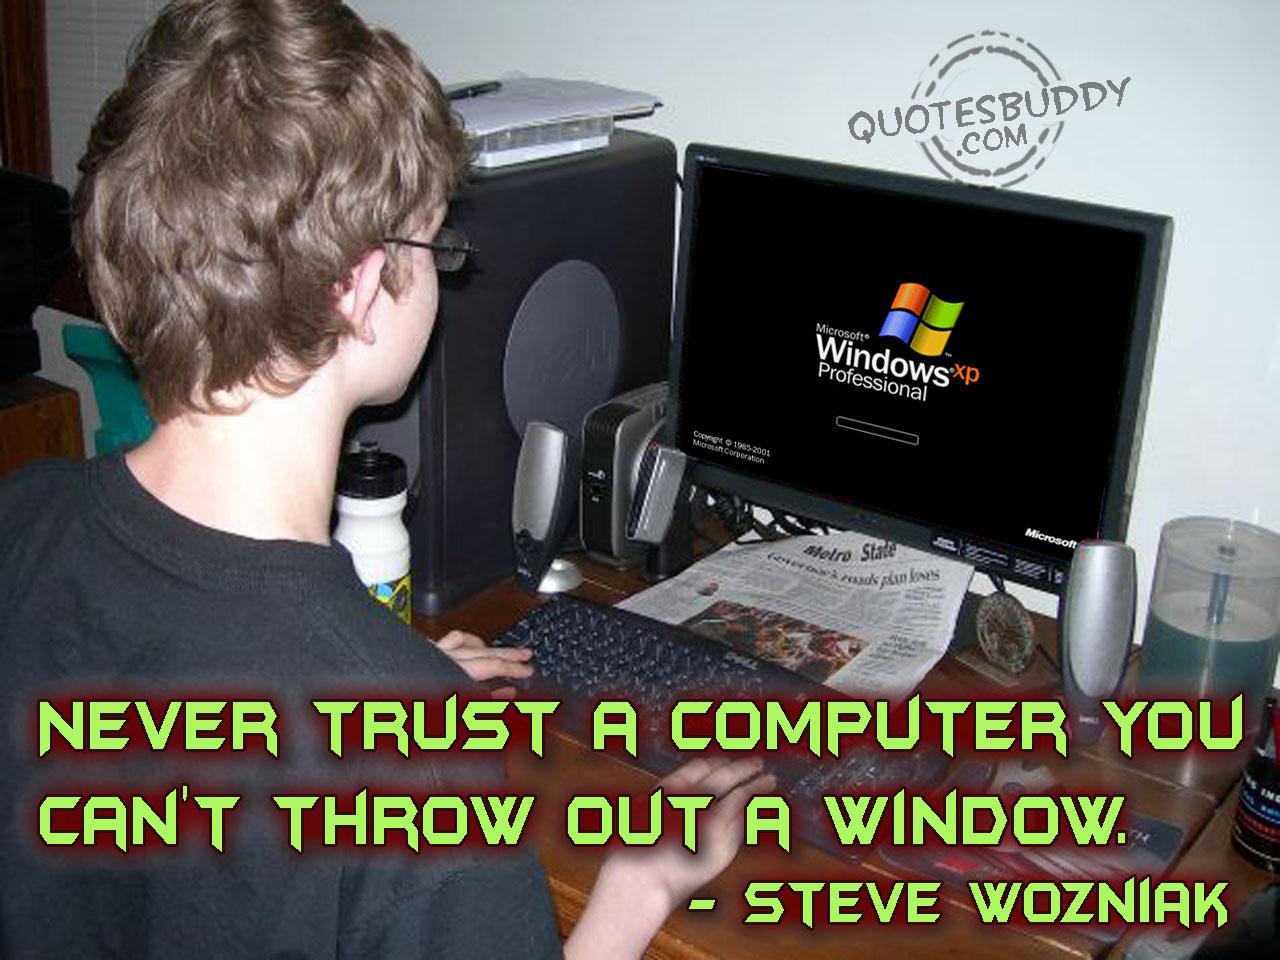 Computer quote #2